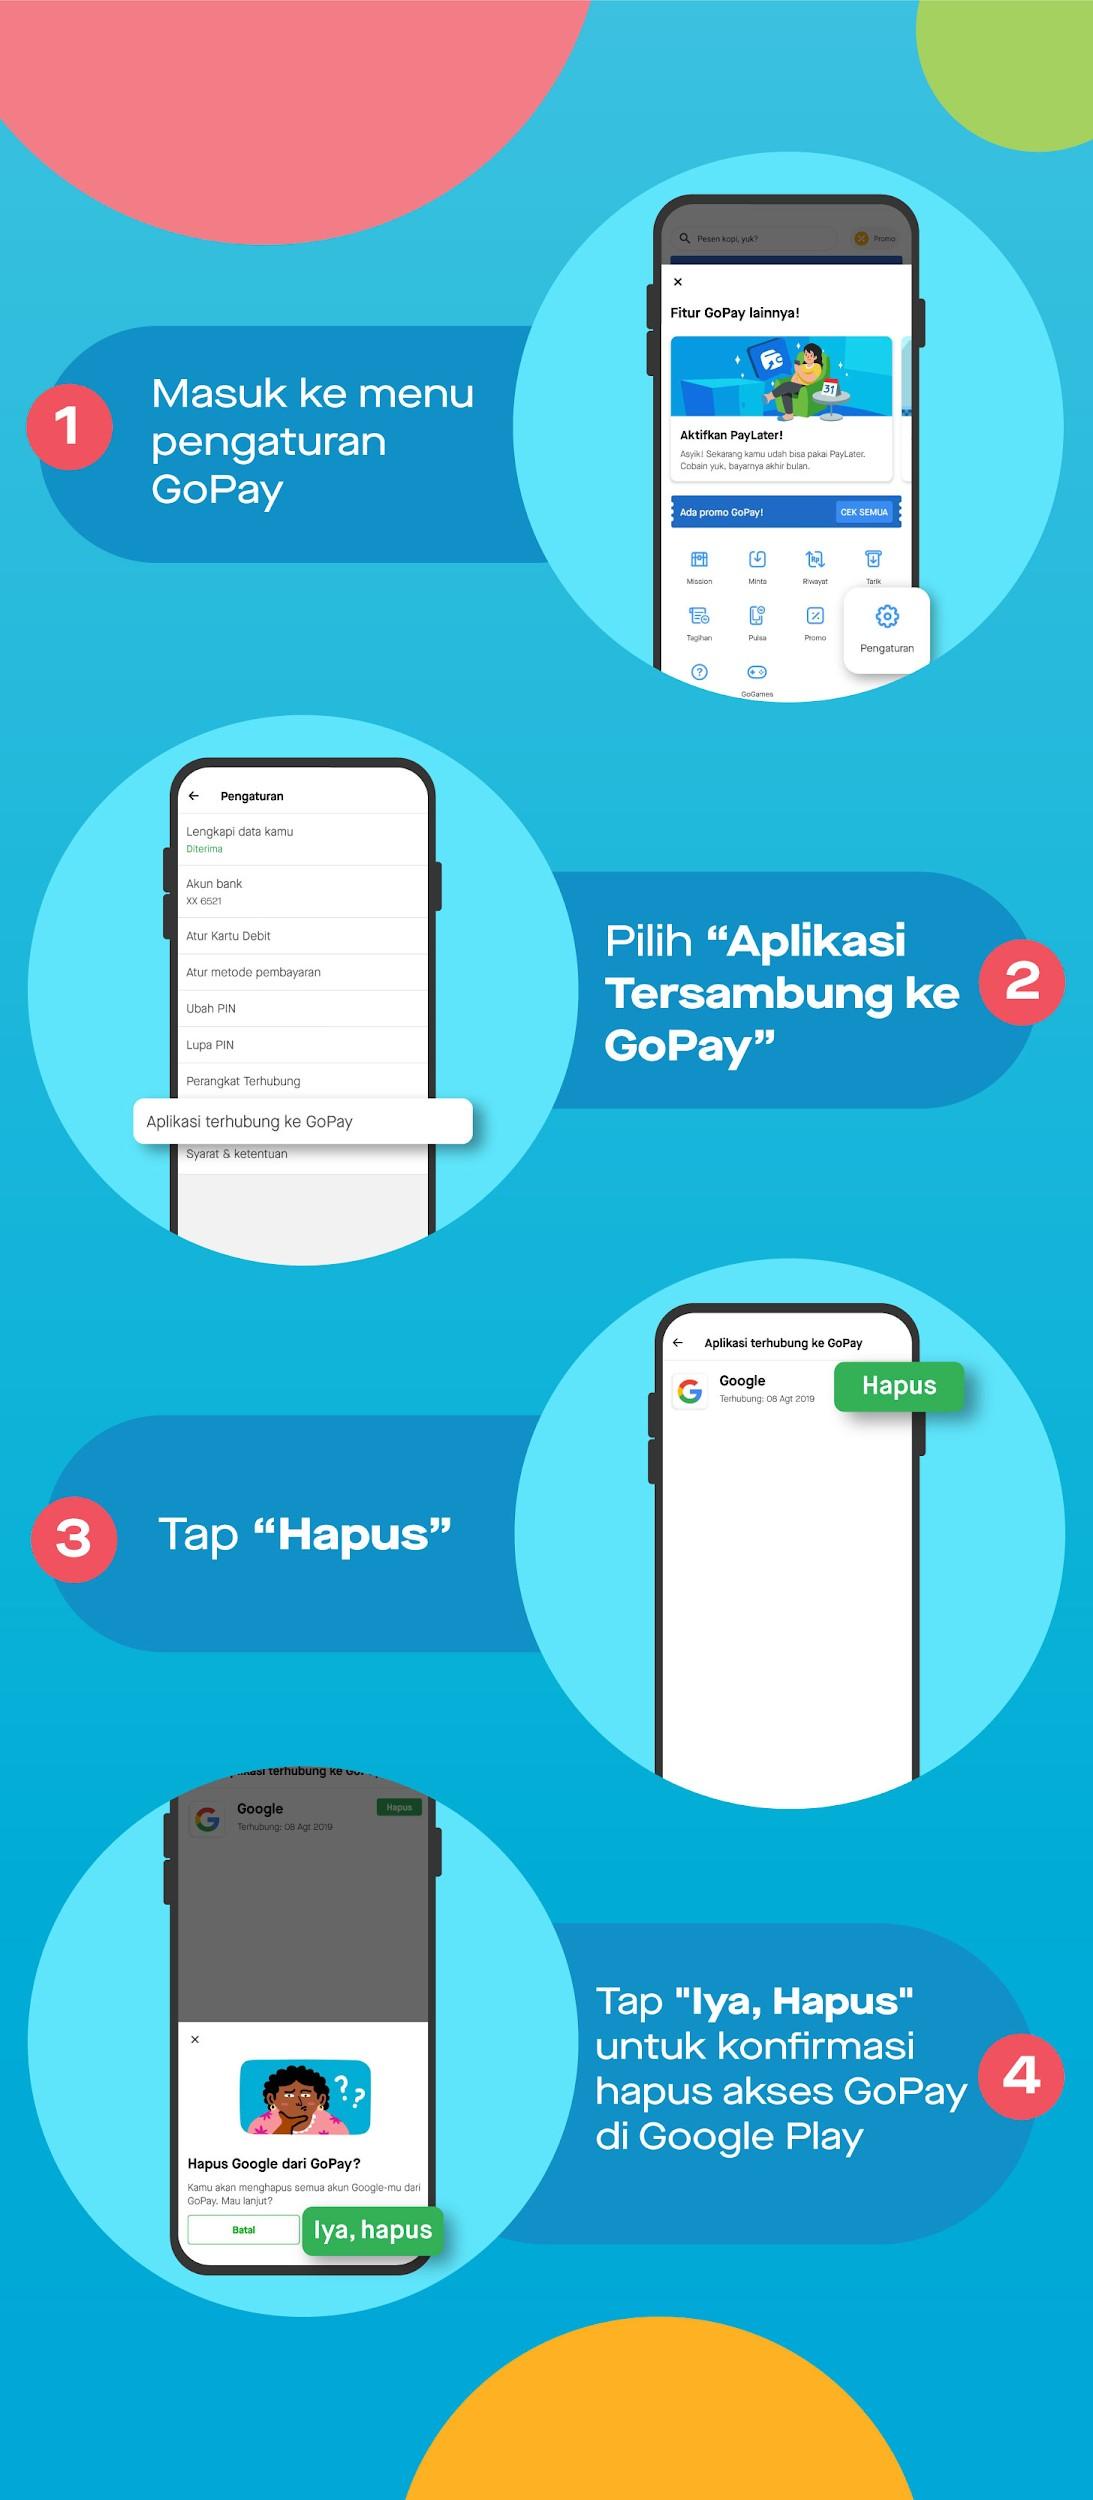 Cara Aktivasi Gopay Di Google Play Reedem Kode Promo Gopay